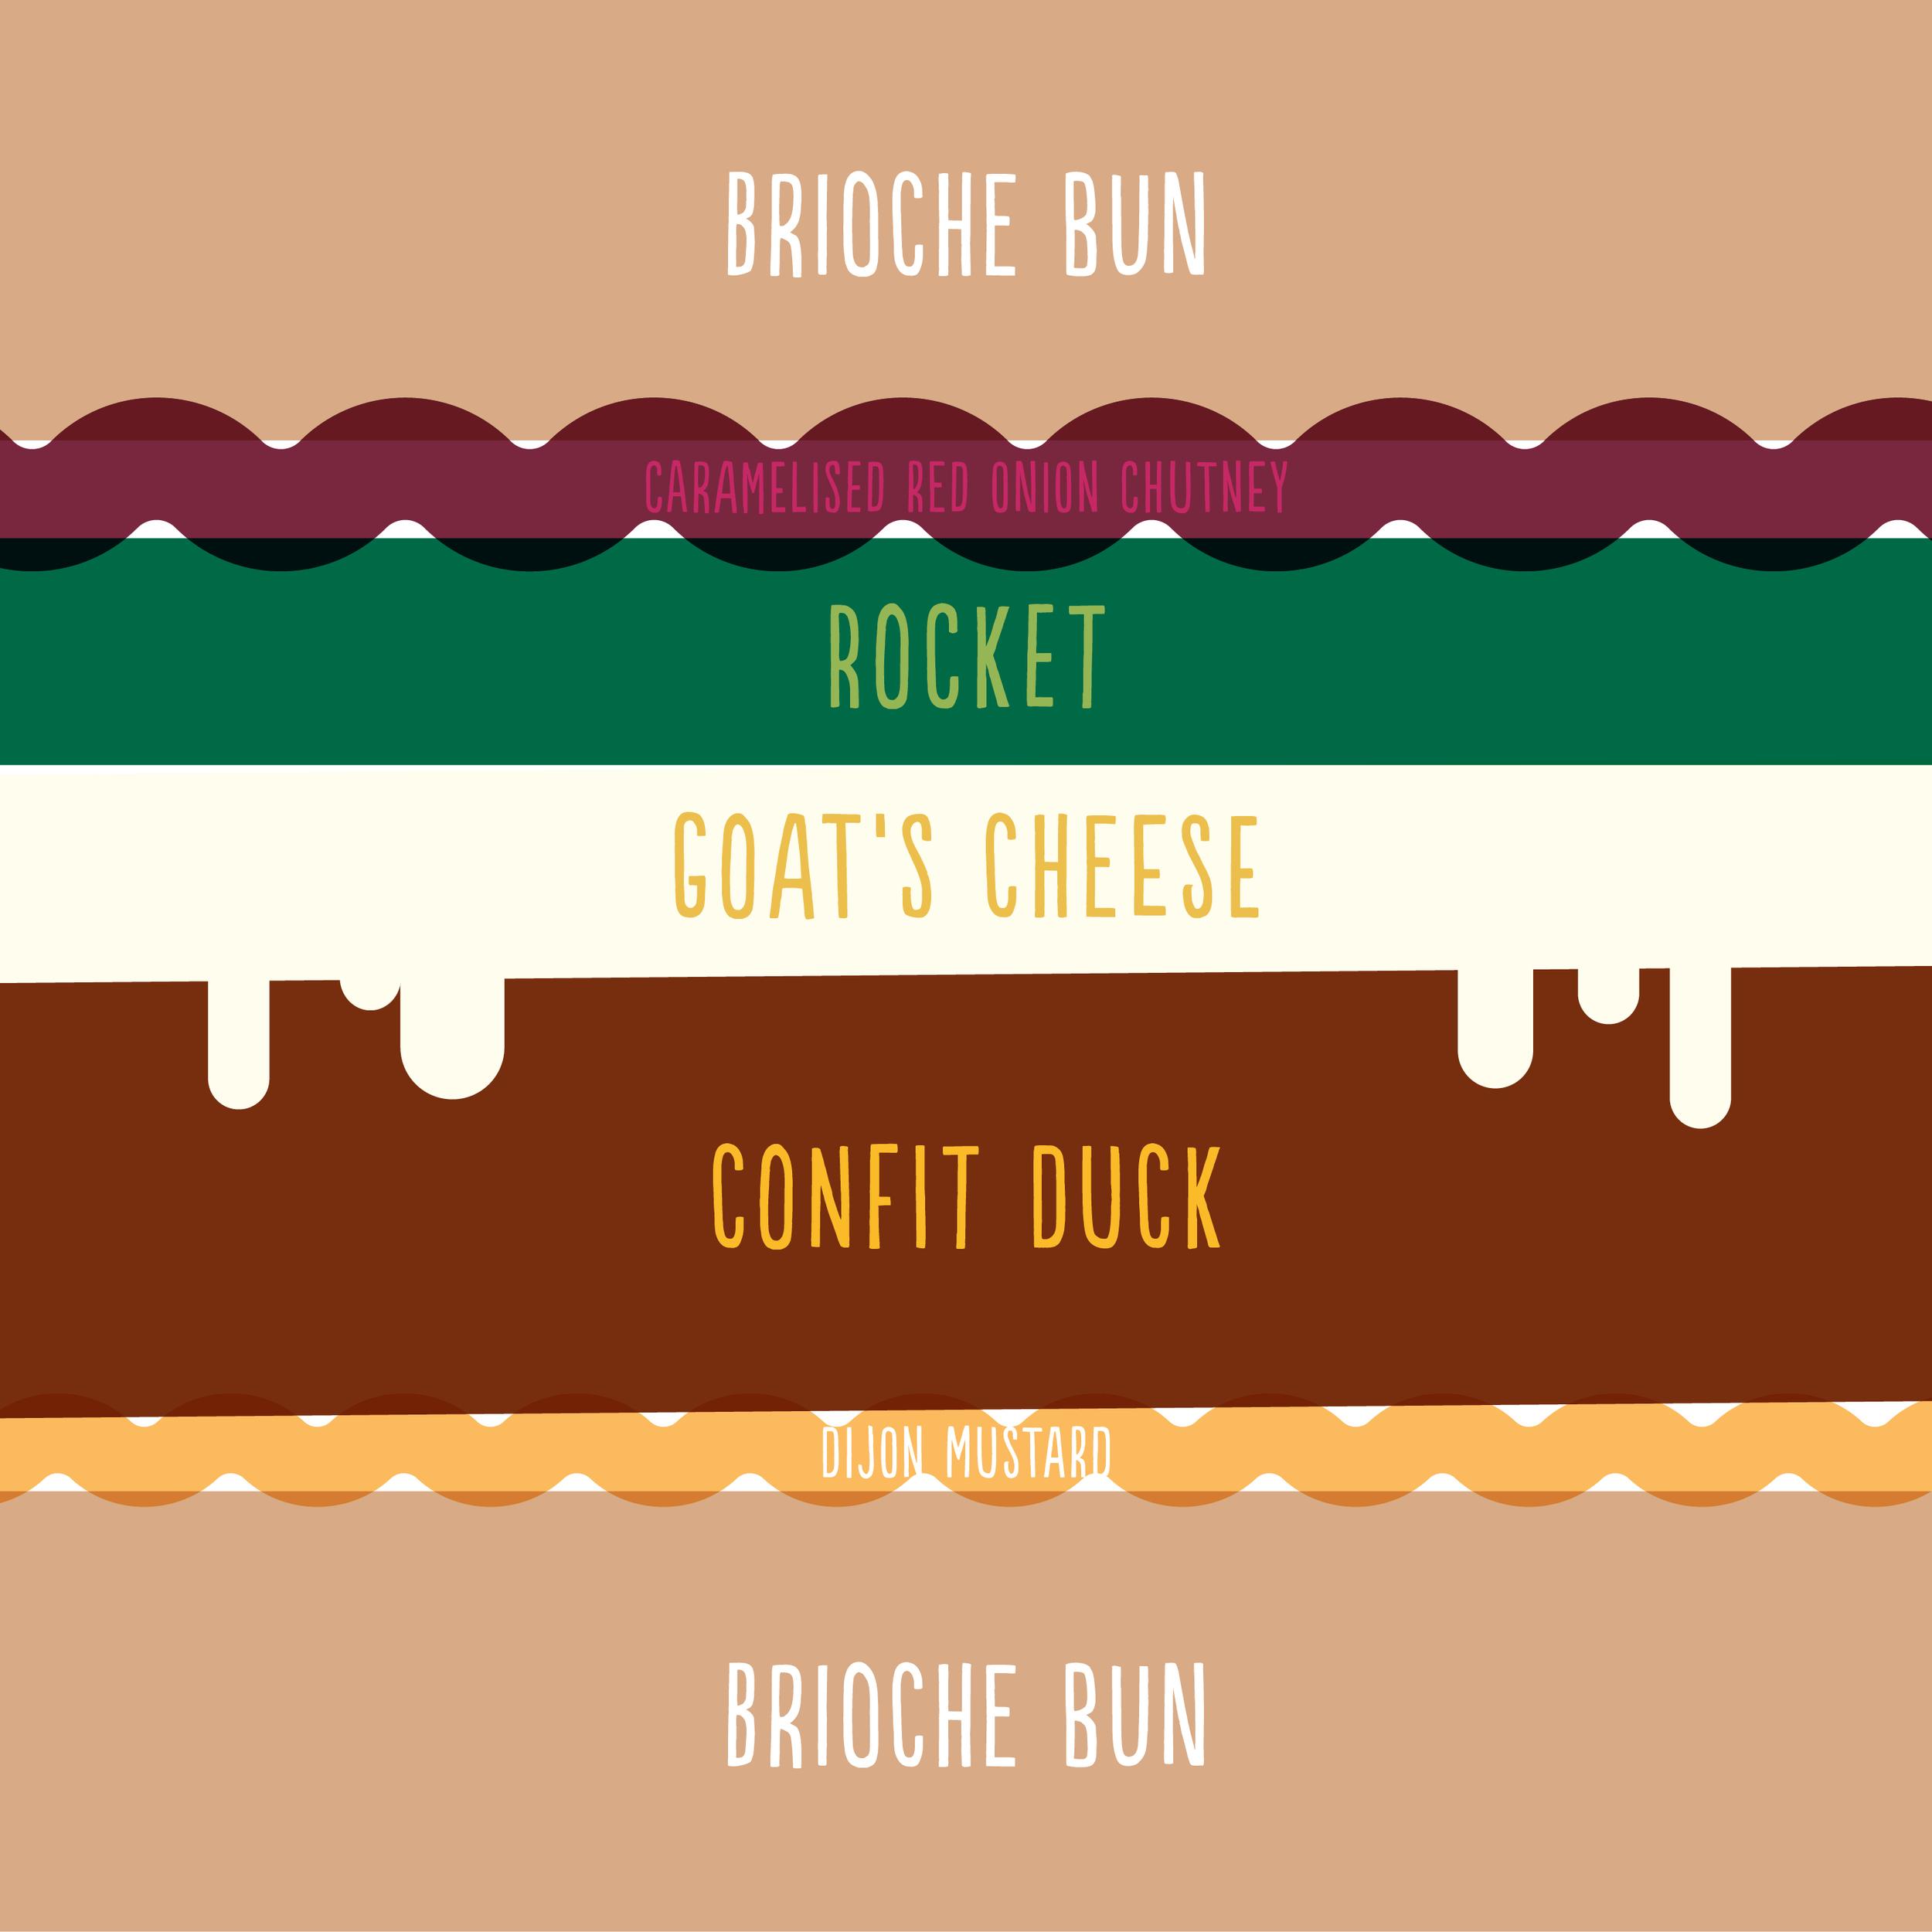 Confit-duck-goats-cheese-rocket-red-onion-chutney-sandwich.jpg